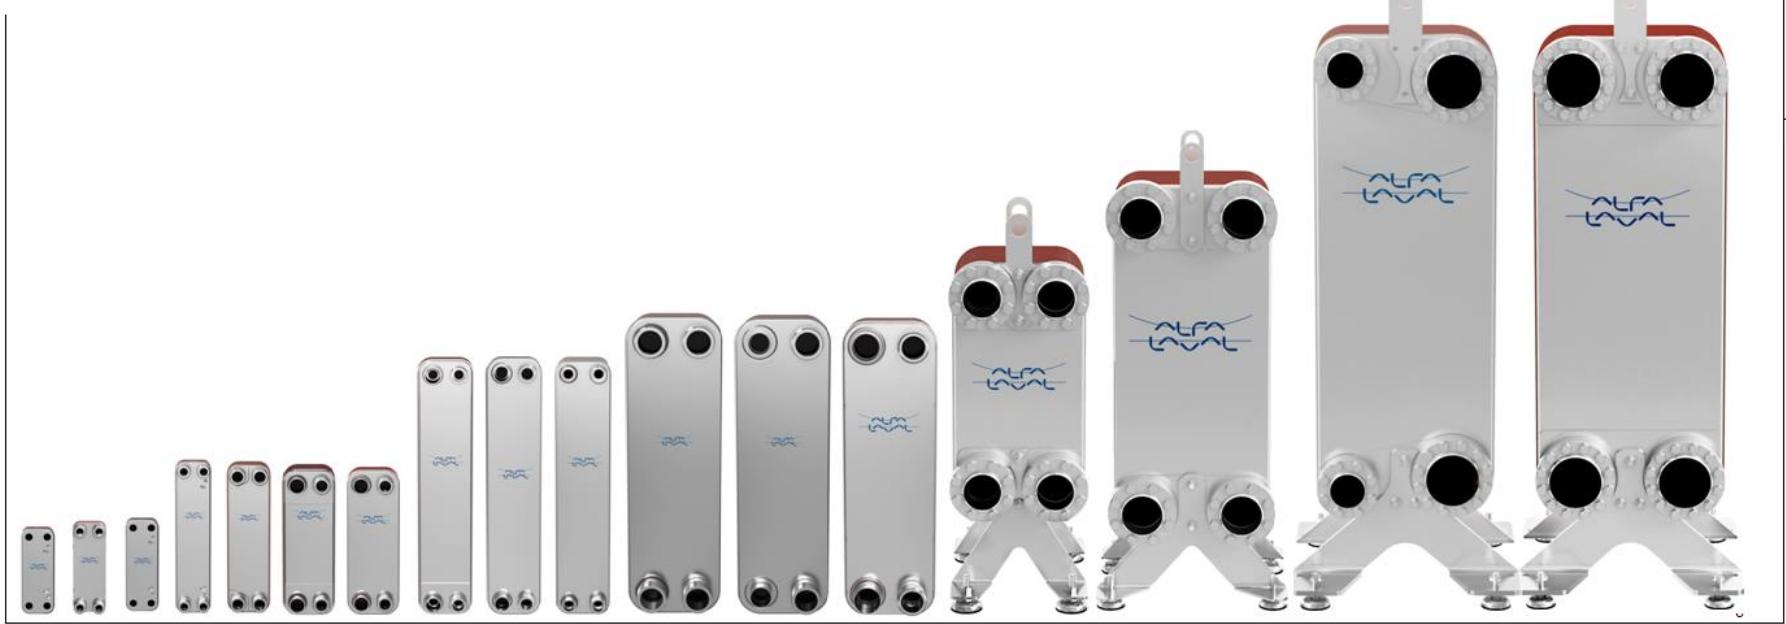 alfa laval welded plate heat exchanger